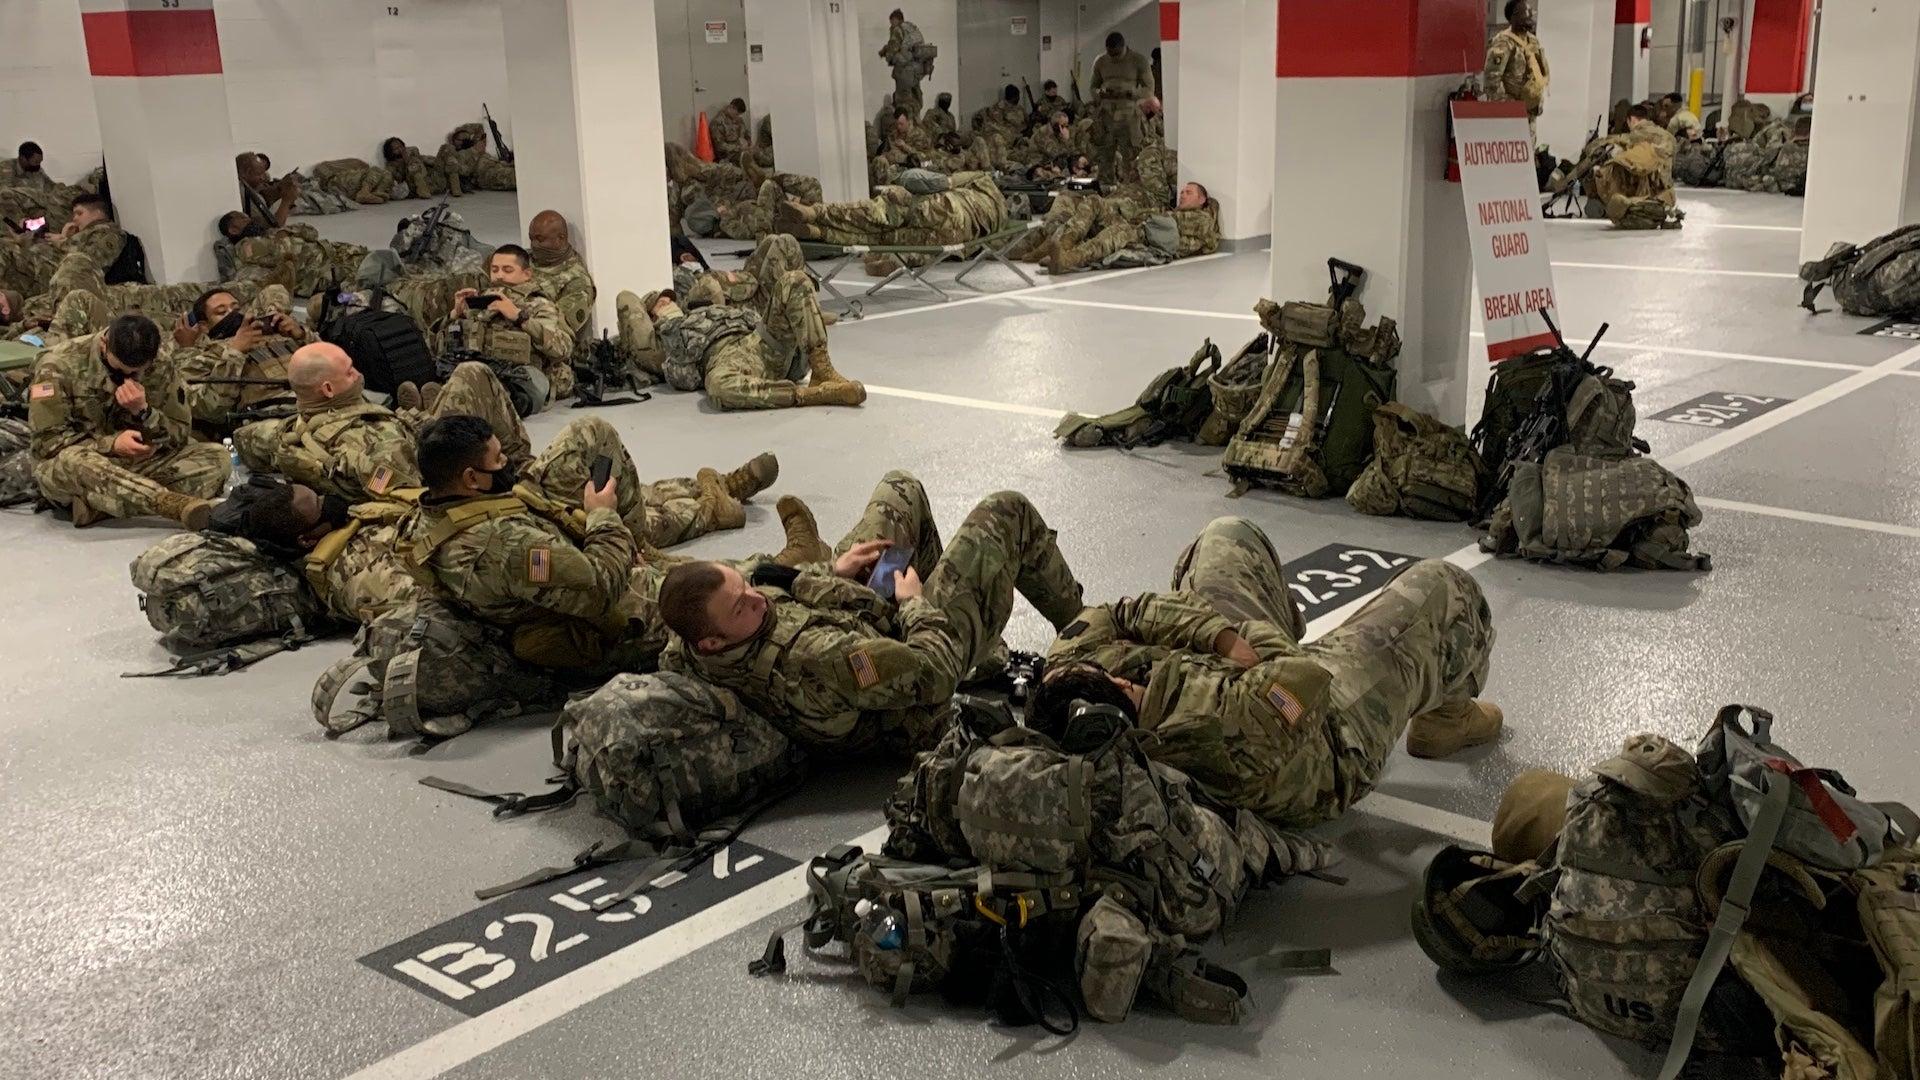 National Guardsmen sleep in parking garages following Biden inauguration